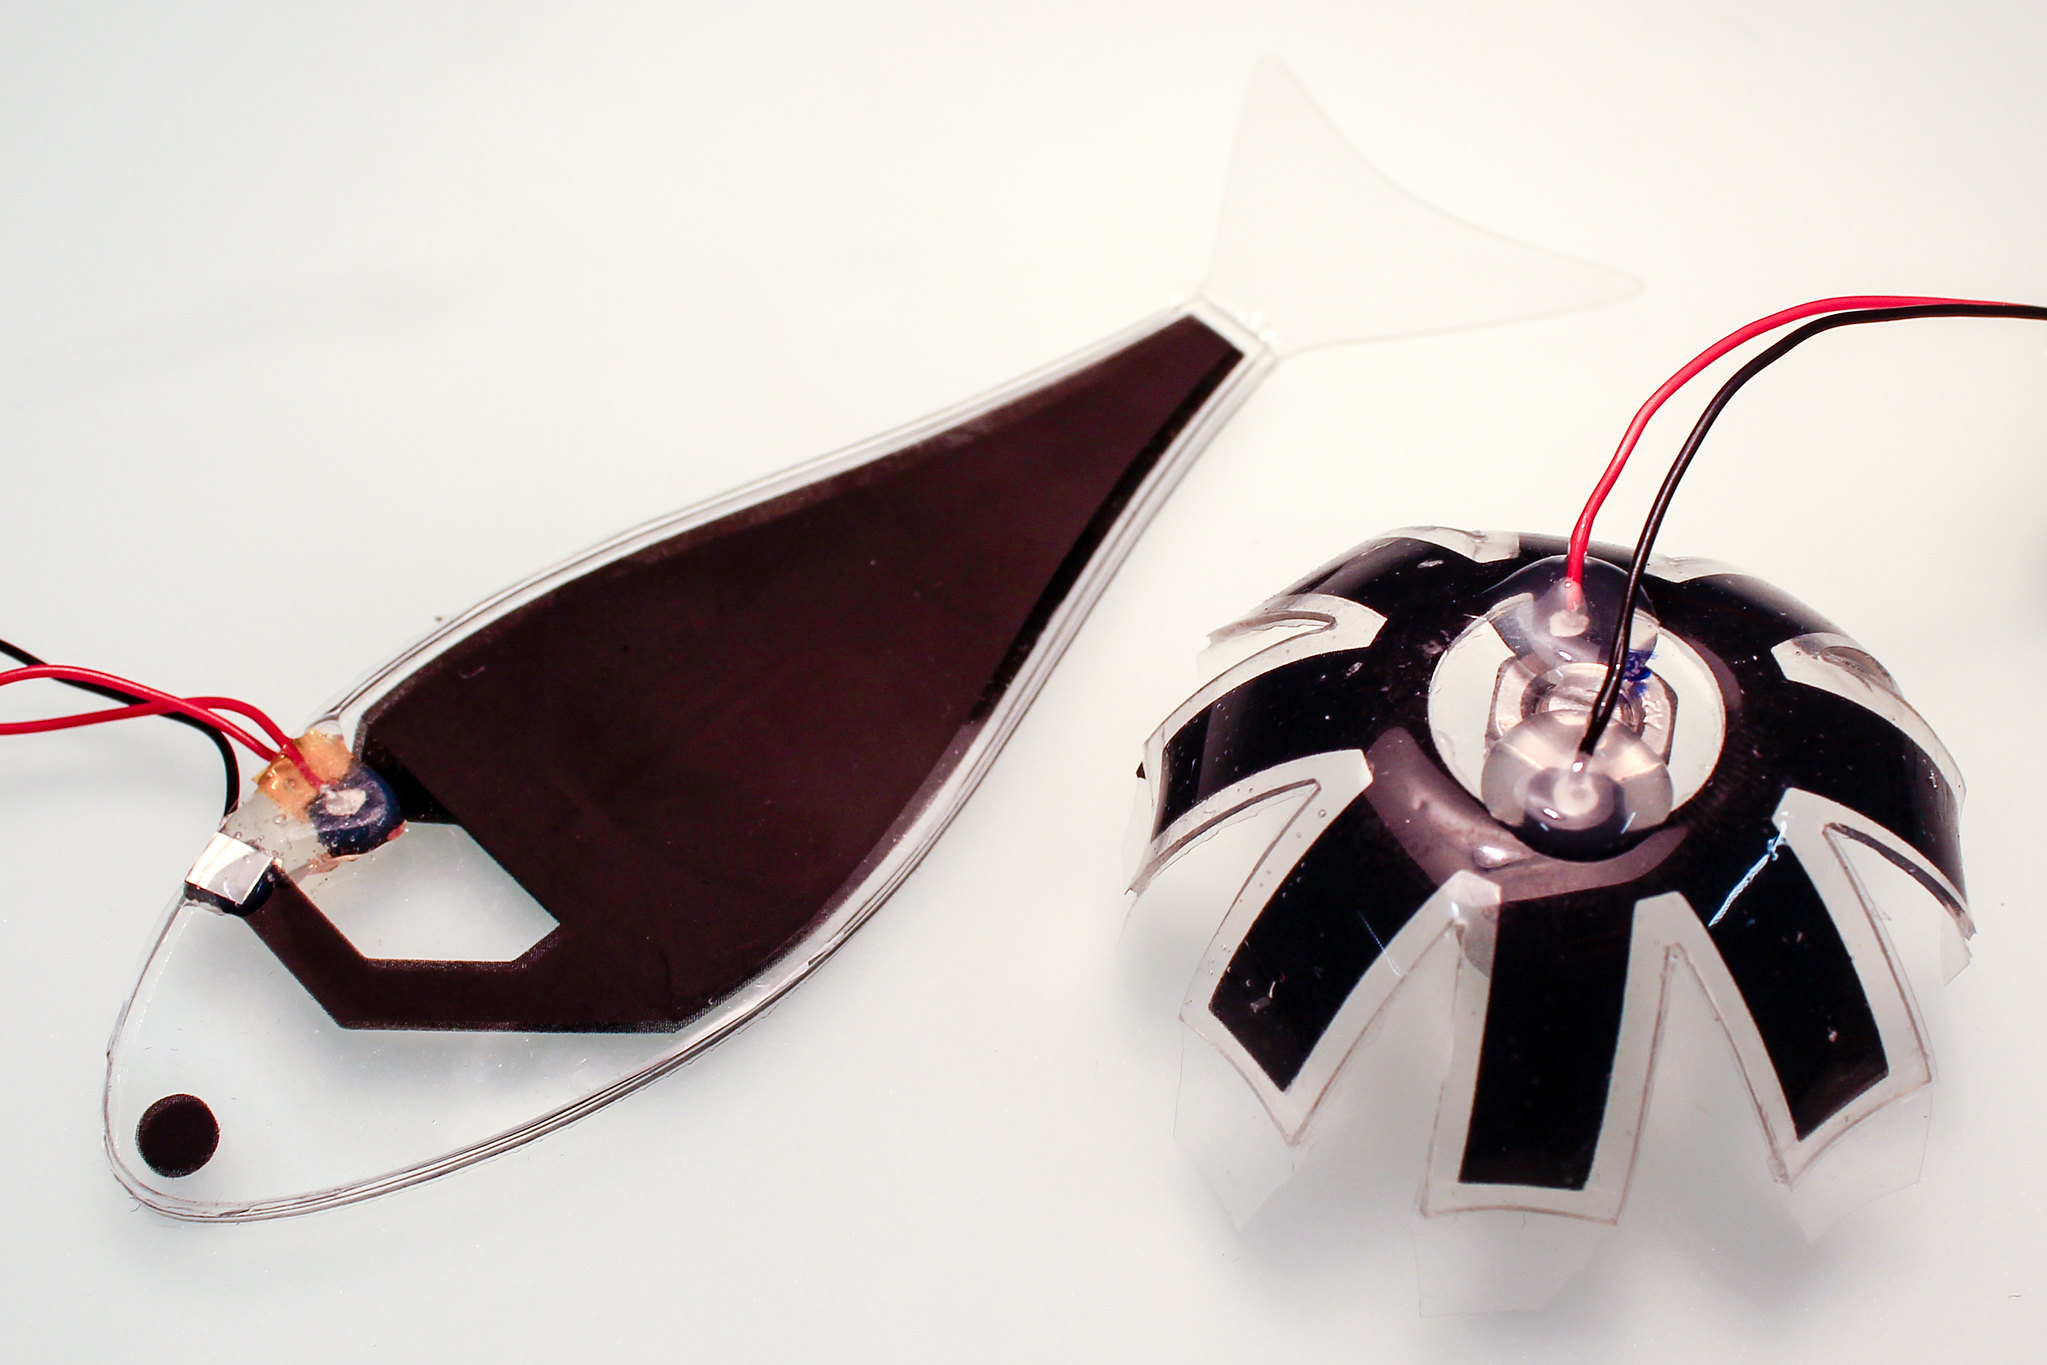 Dual-stiffness origami drone